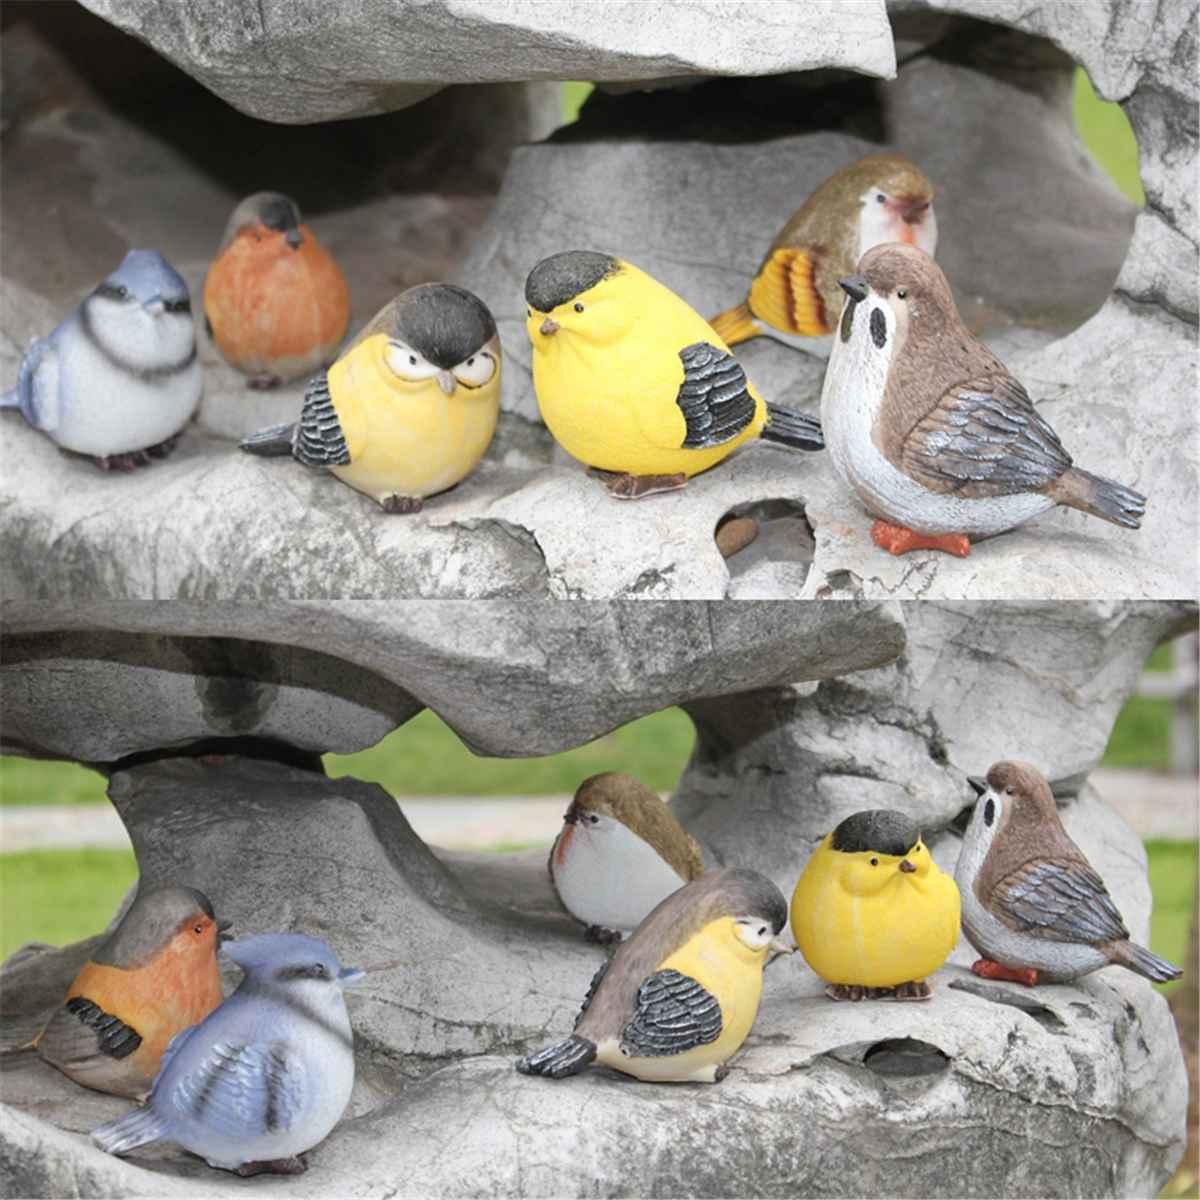 6pcs/set DIY Micro Pot Plant Decoration Artificial Birds doll,Small bird Landscape Bonsai Plant Garden Ornament and Decorations